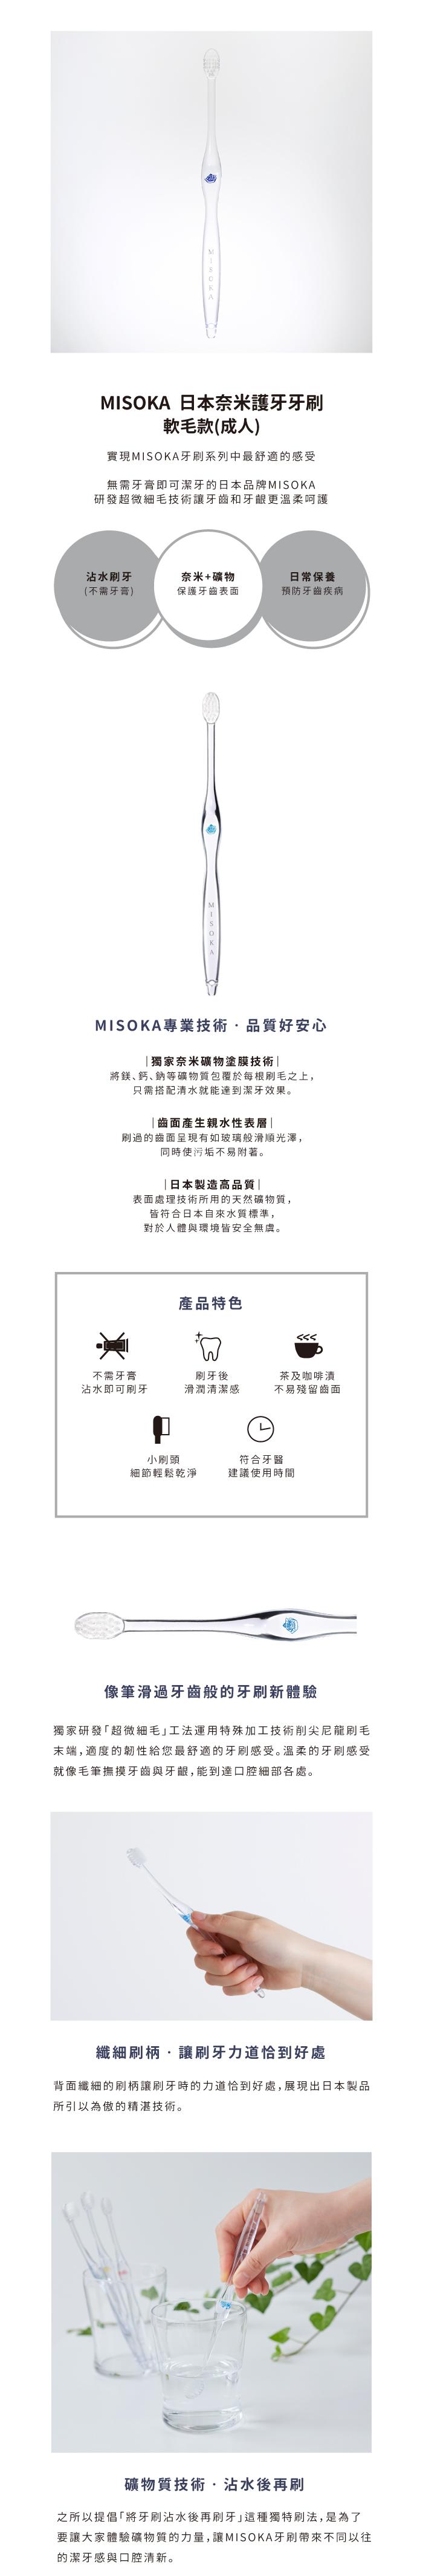 MISOKA │  COMFORT 軟毛款頂級免沾牙膏牙刷 (日本製 / 若草色 / 成人)